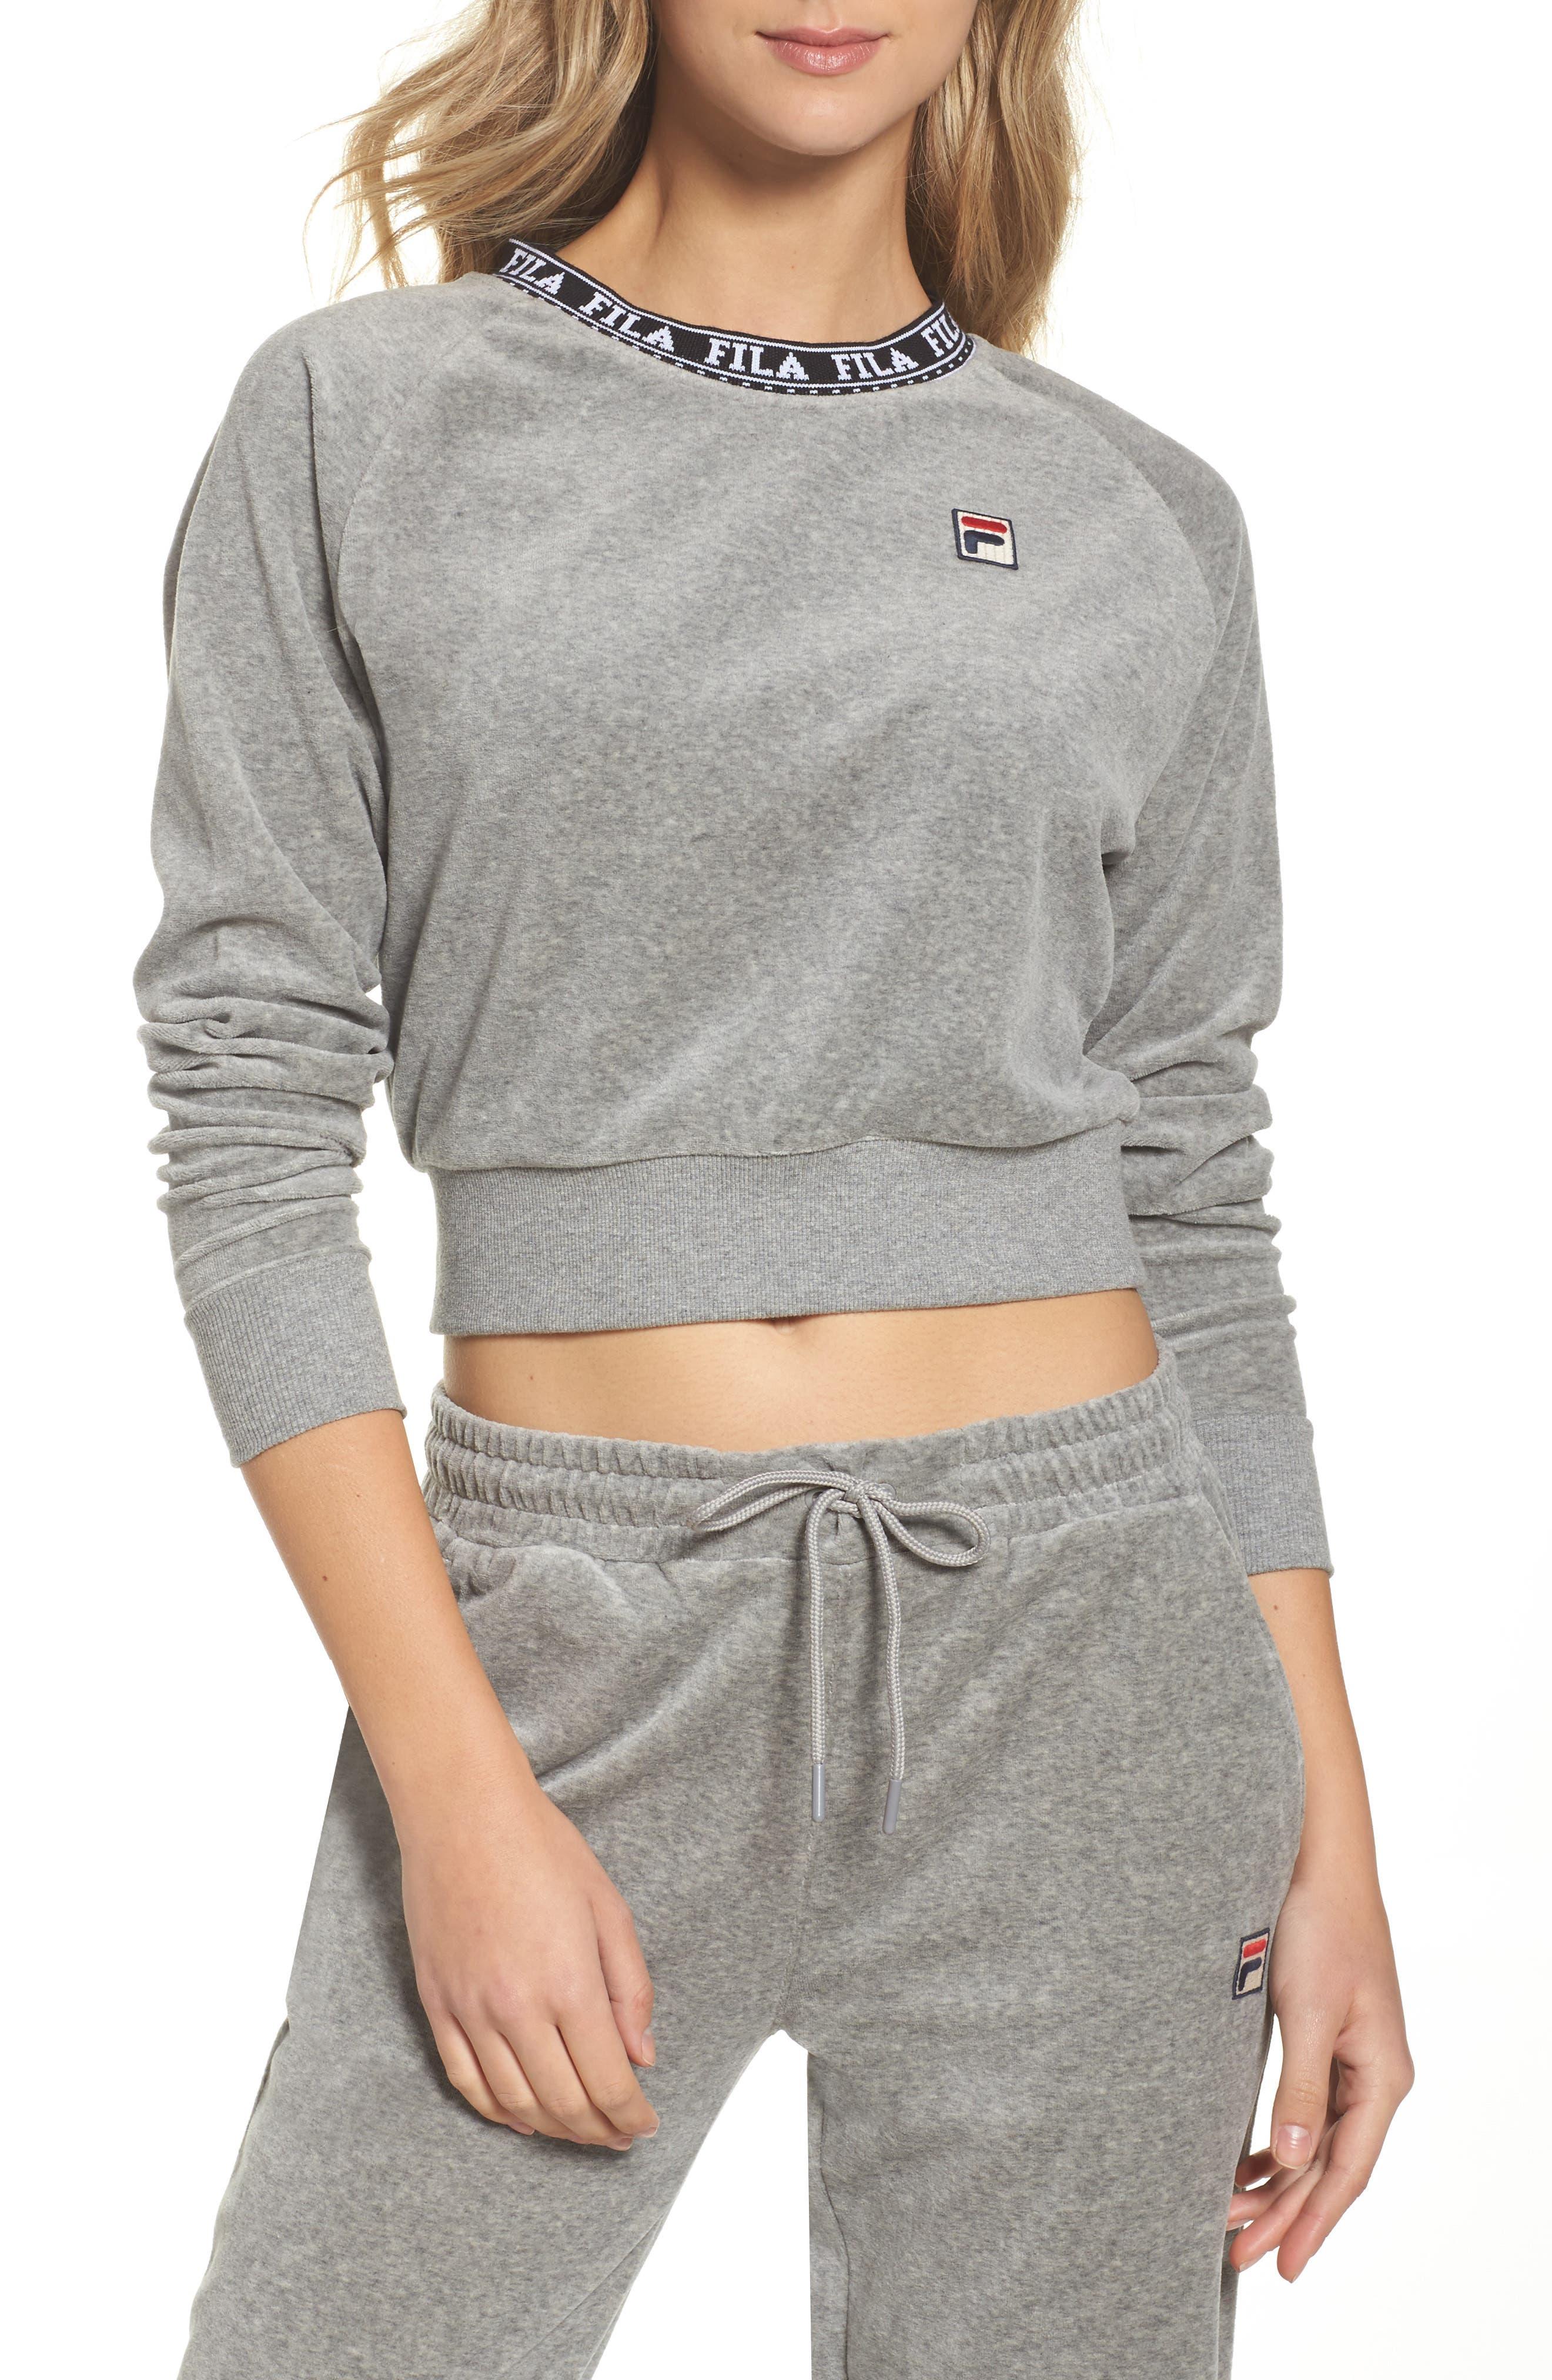 Dina Velour Crop Sweatshirt,                         Main,                         color, Grey Heather/ Black/ White